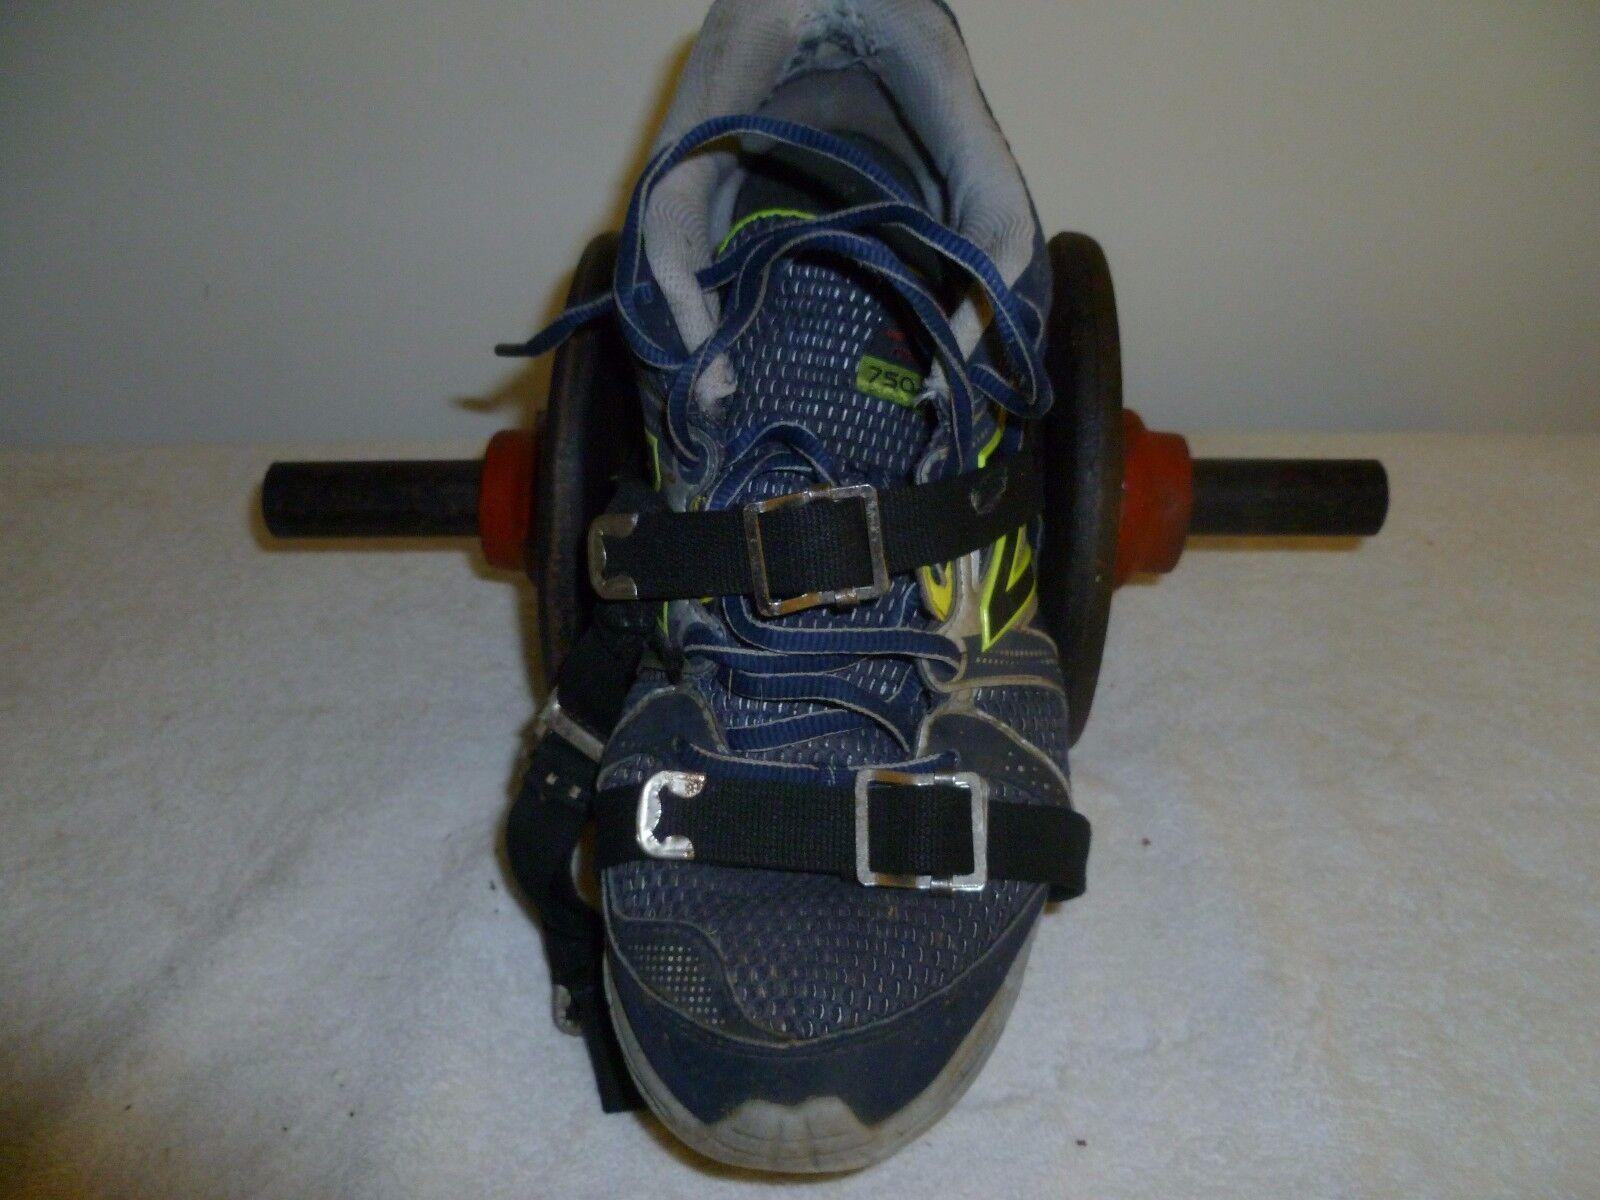 Zapato de peso y dos placas de peso de 5 lb Barbell Dumbbell extensión de pierna rodilla de rehabilitación,